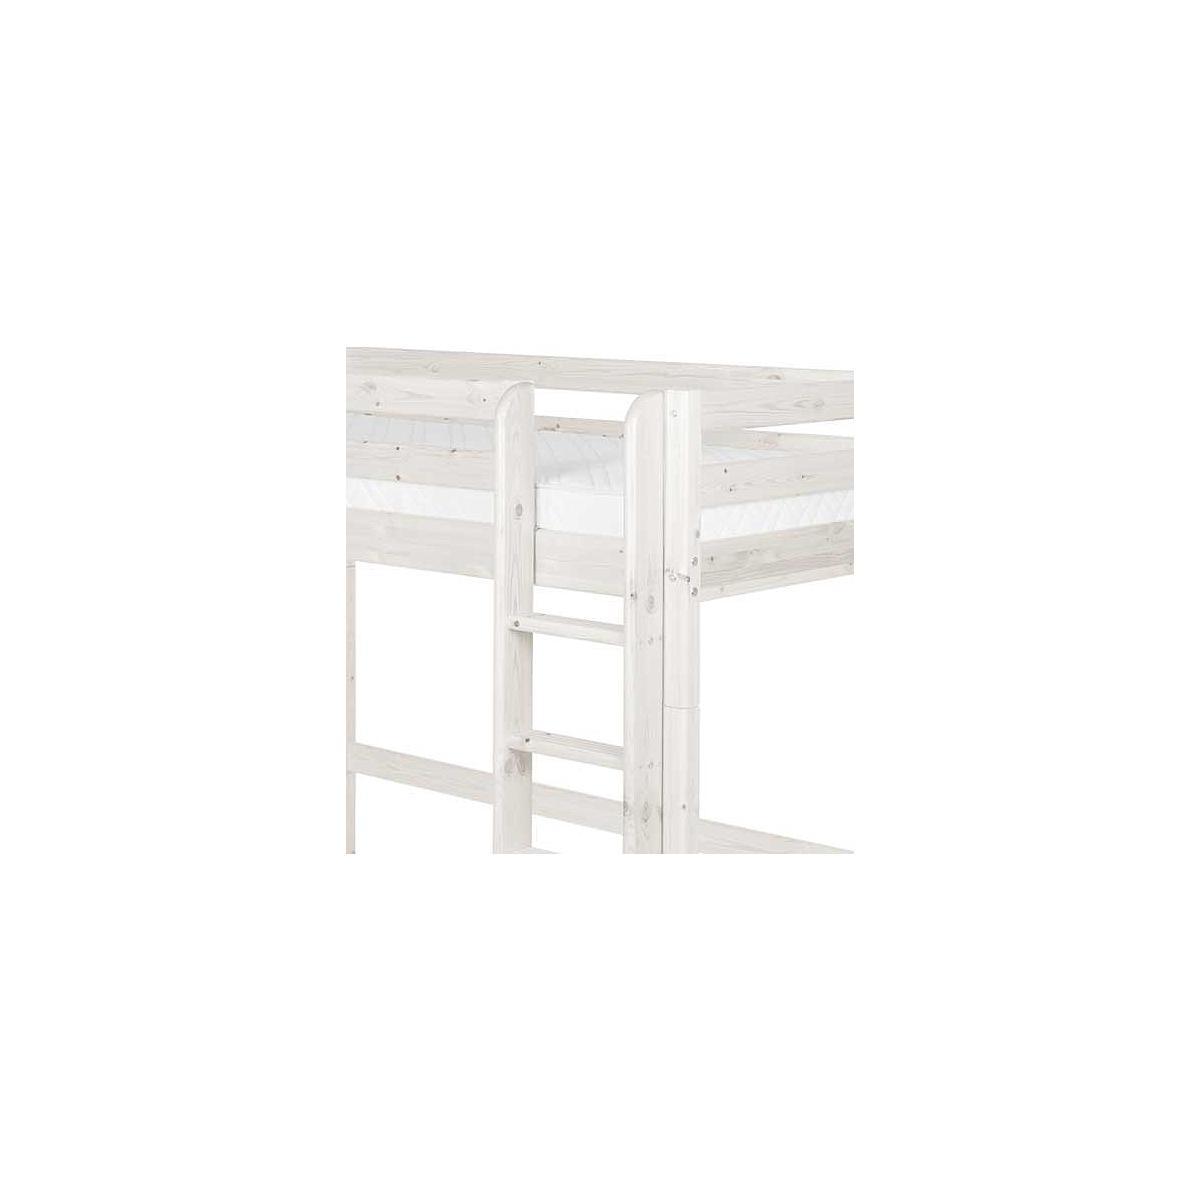 Cama alta 90x190 CLASSIC Flexa escalera recta blanco cal